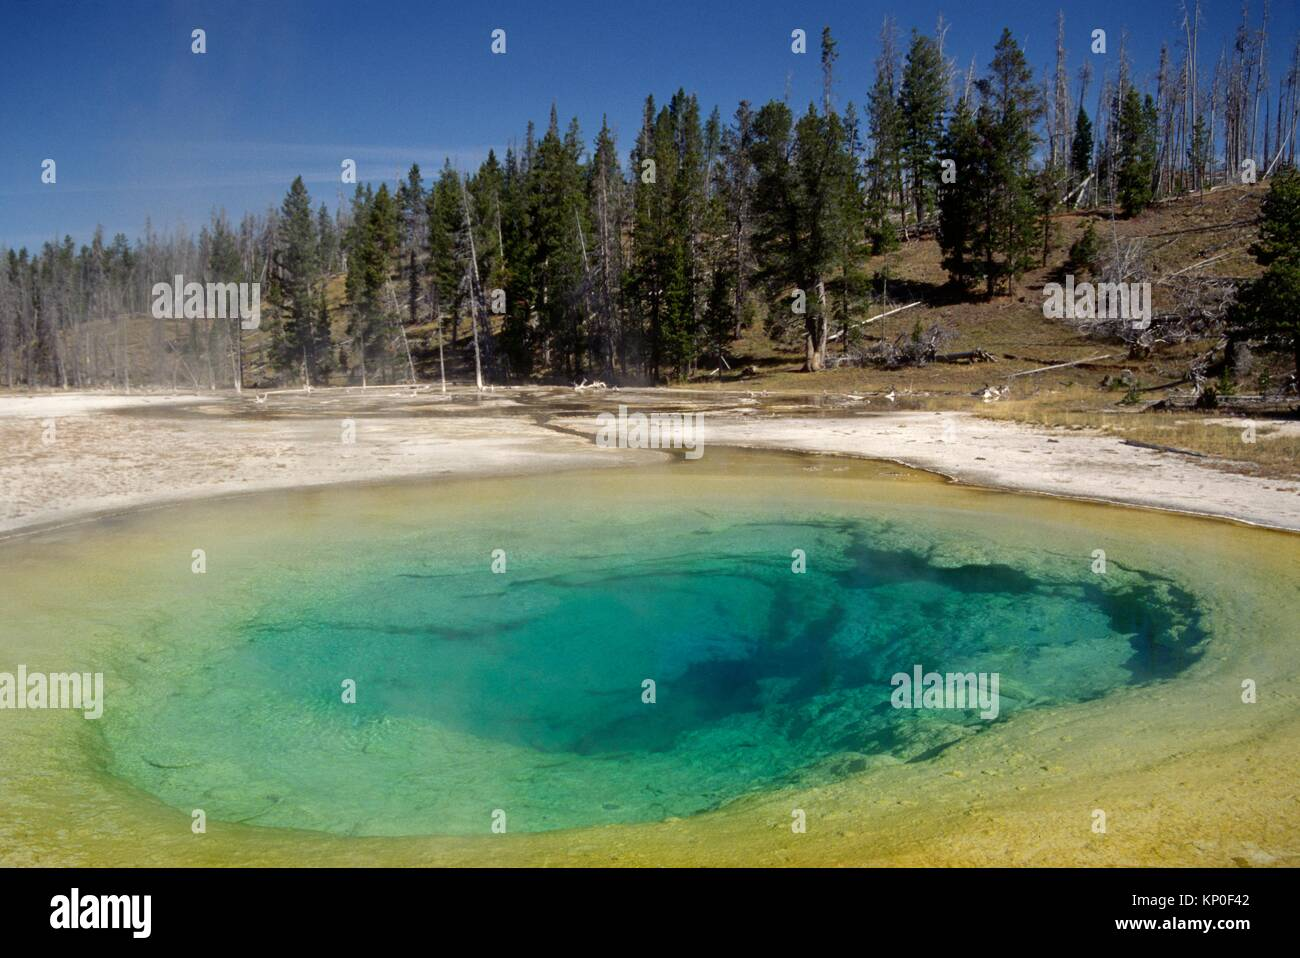 Morning Glory Pool, Yellowstone National Park, Wyoming. - Stock Image